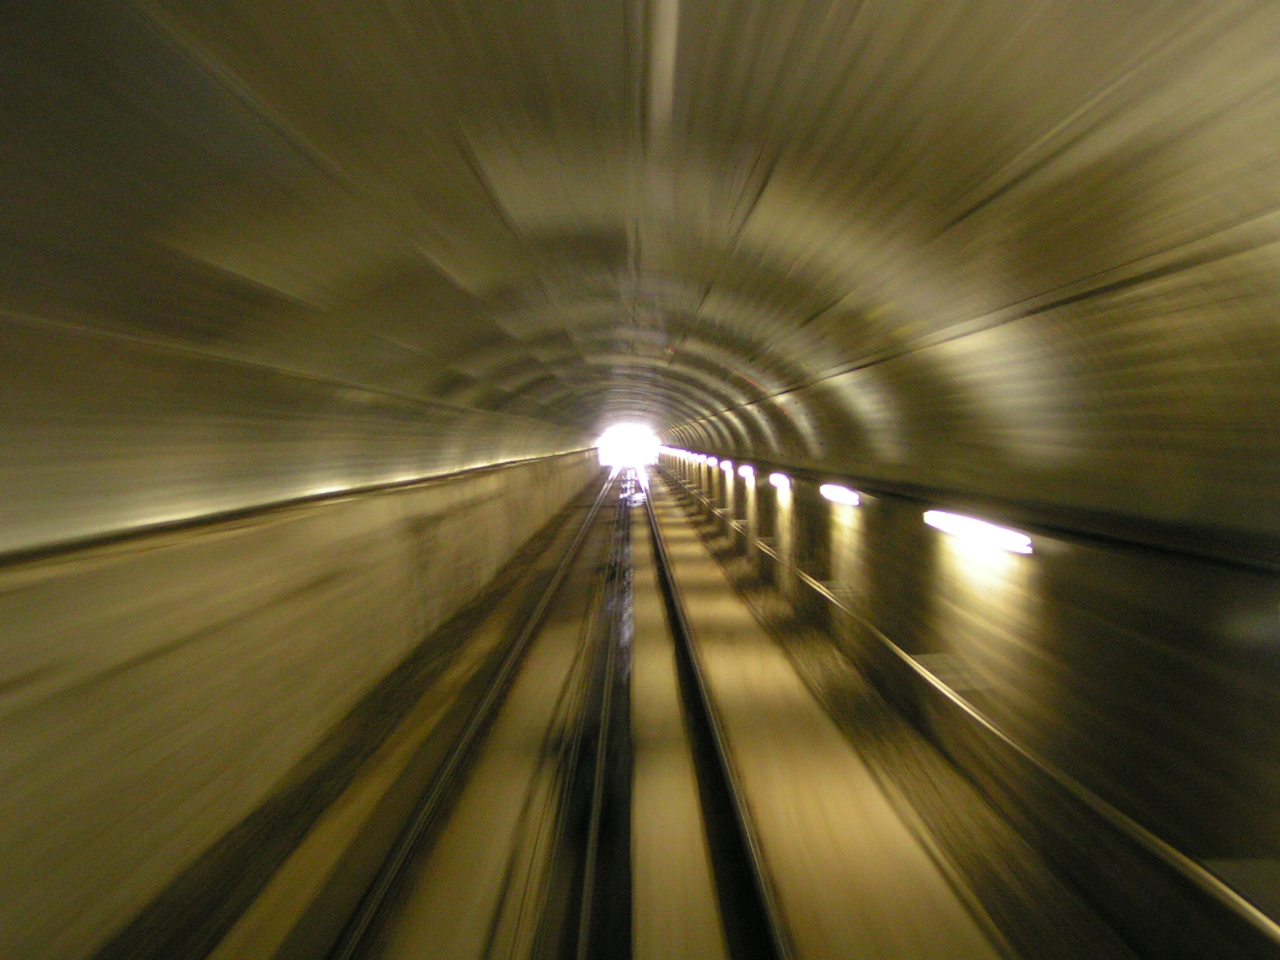 Entering the highest underground railway station in the world